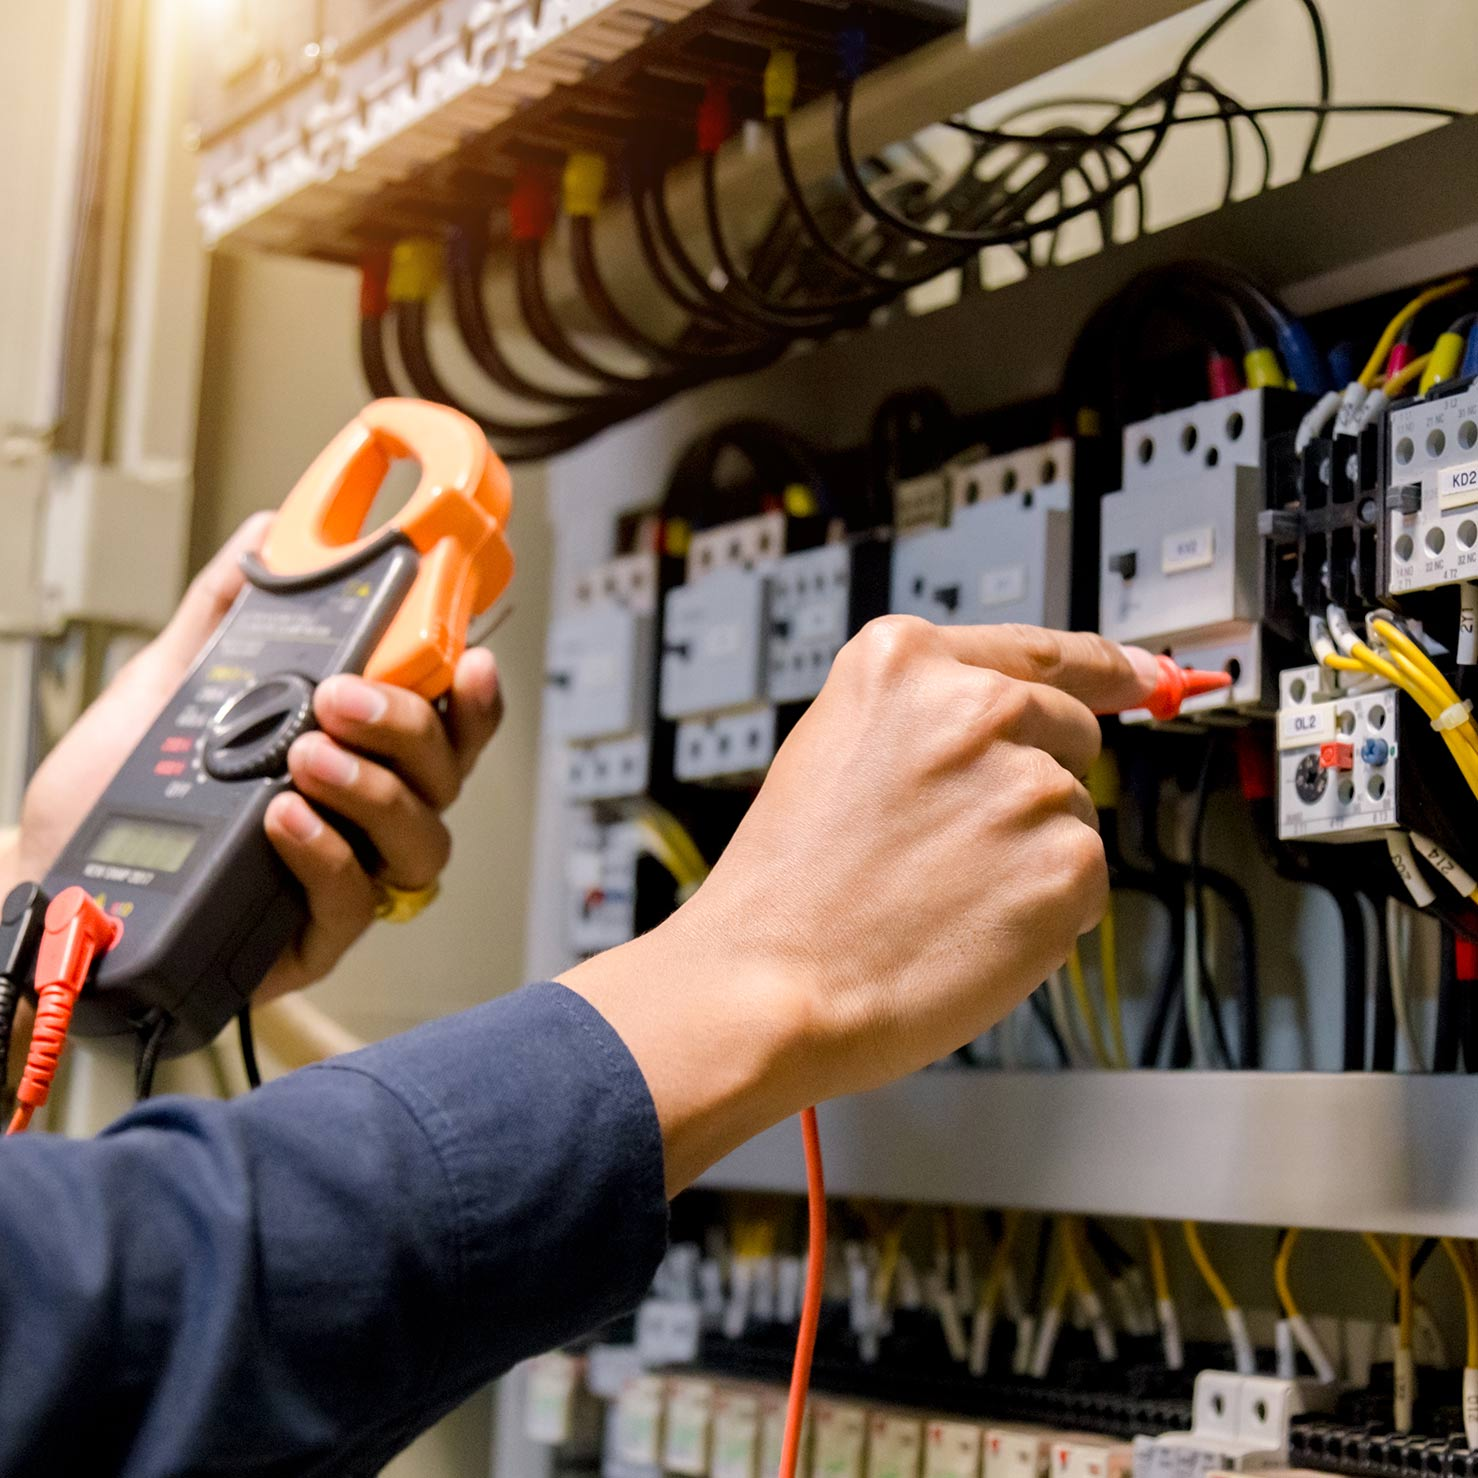 shutterstock.com - A stockphoto